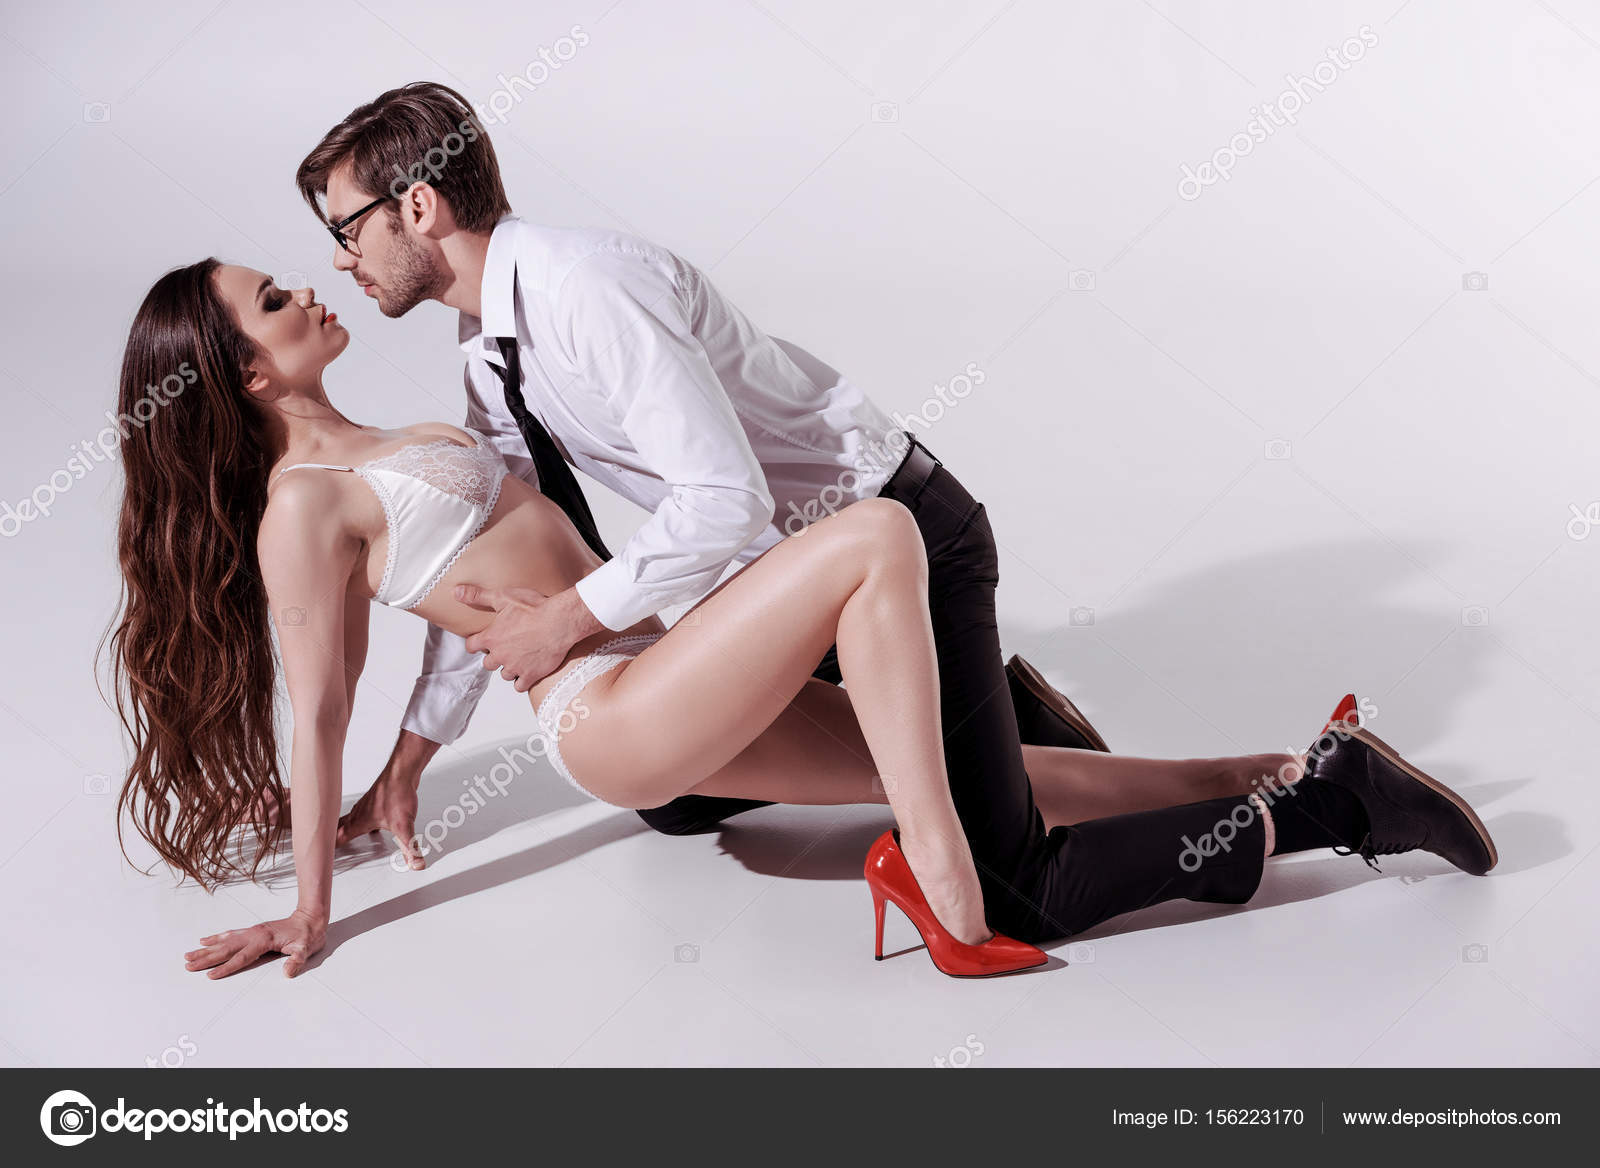 Foreplay seduction